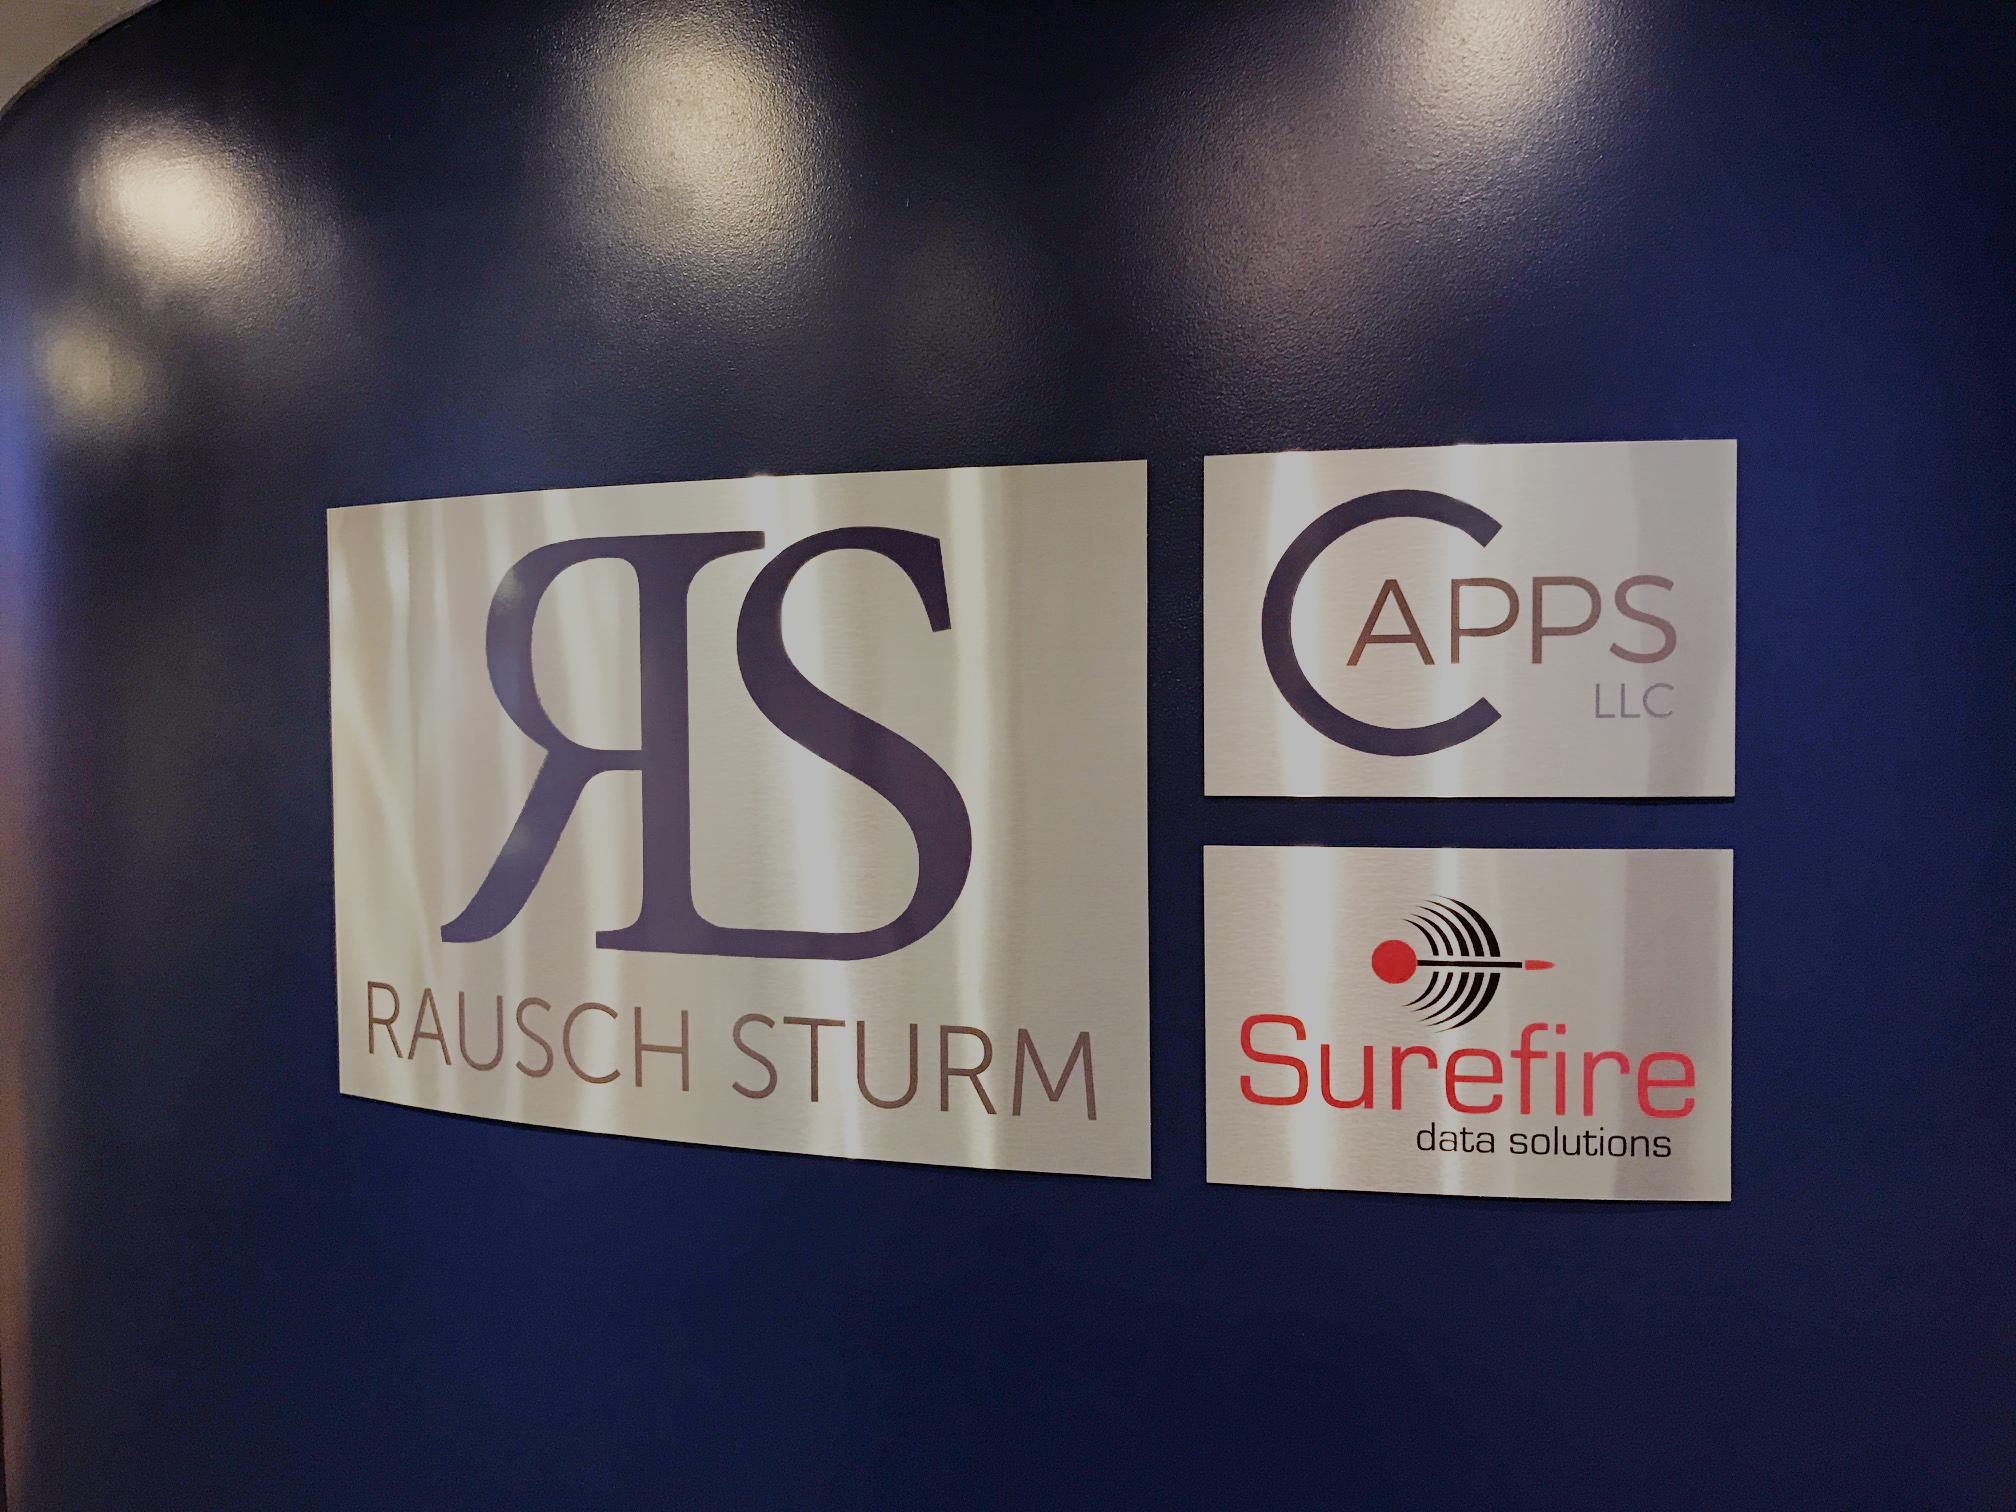 Rausch Sturm Office Signage